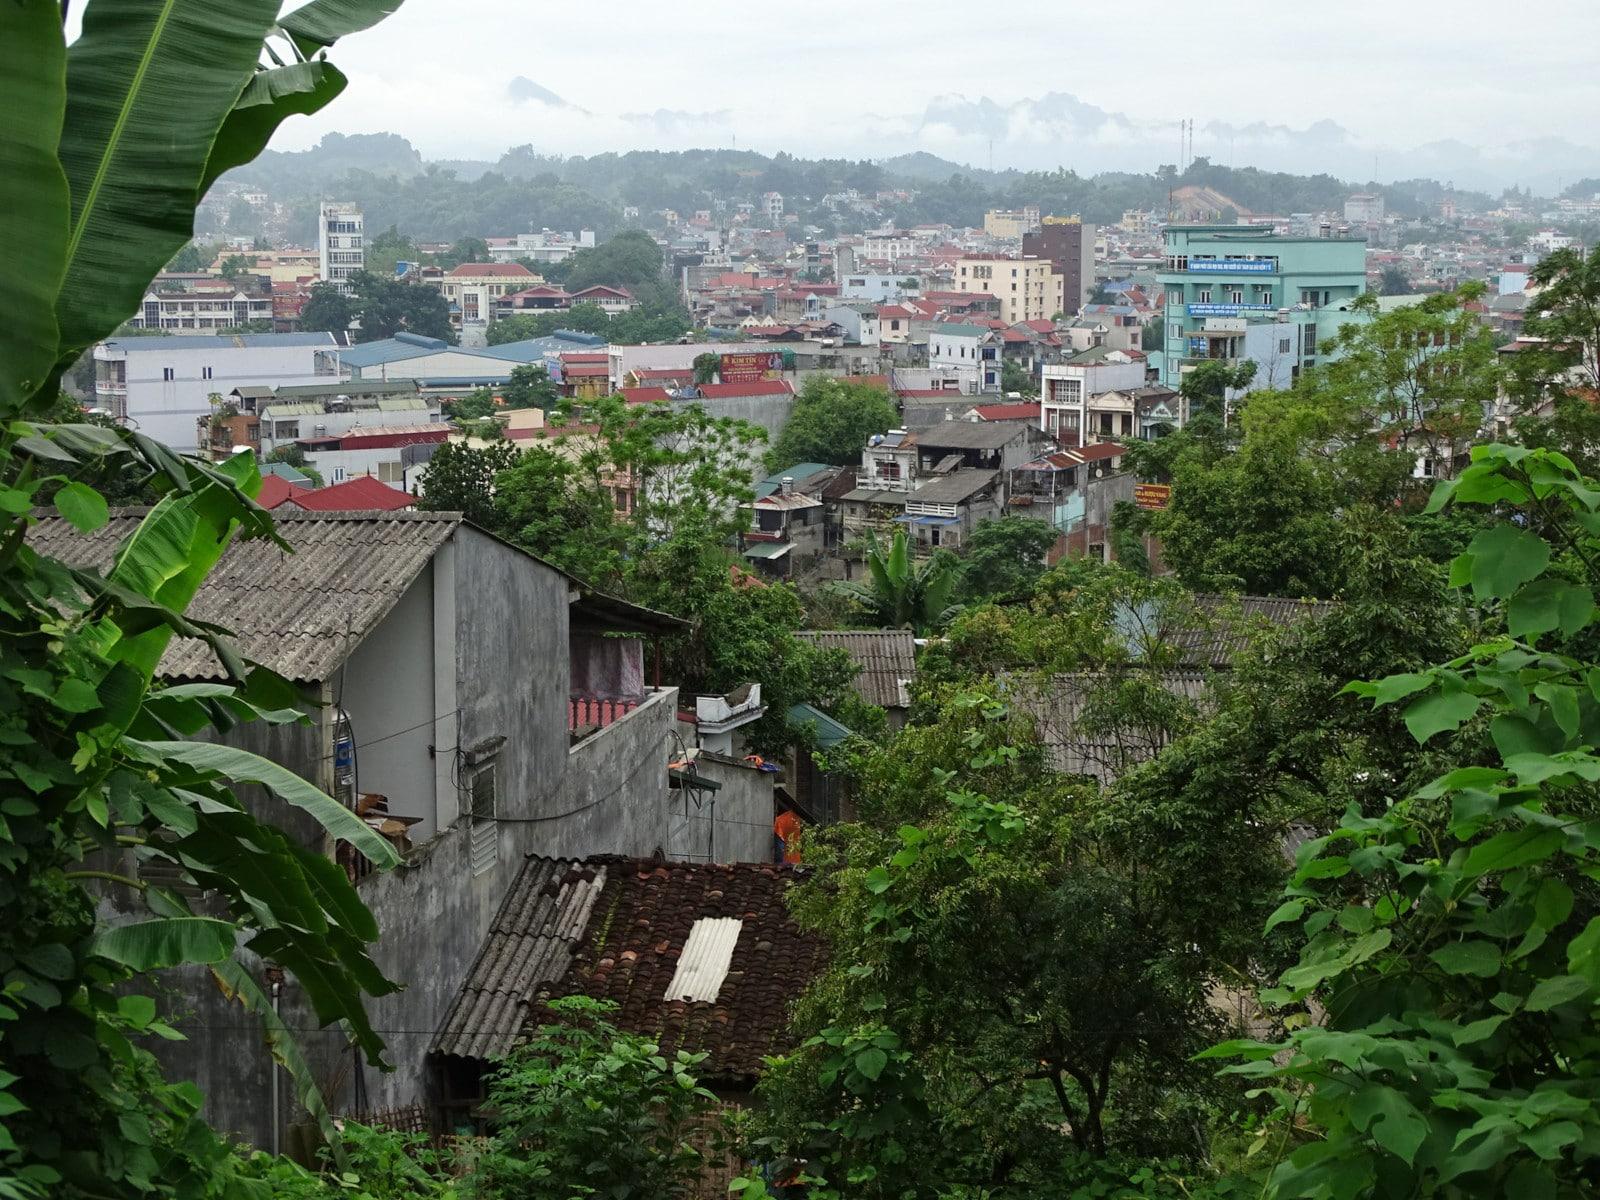 Image of Cao Bang City in Vietnam